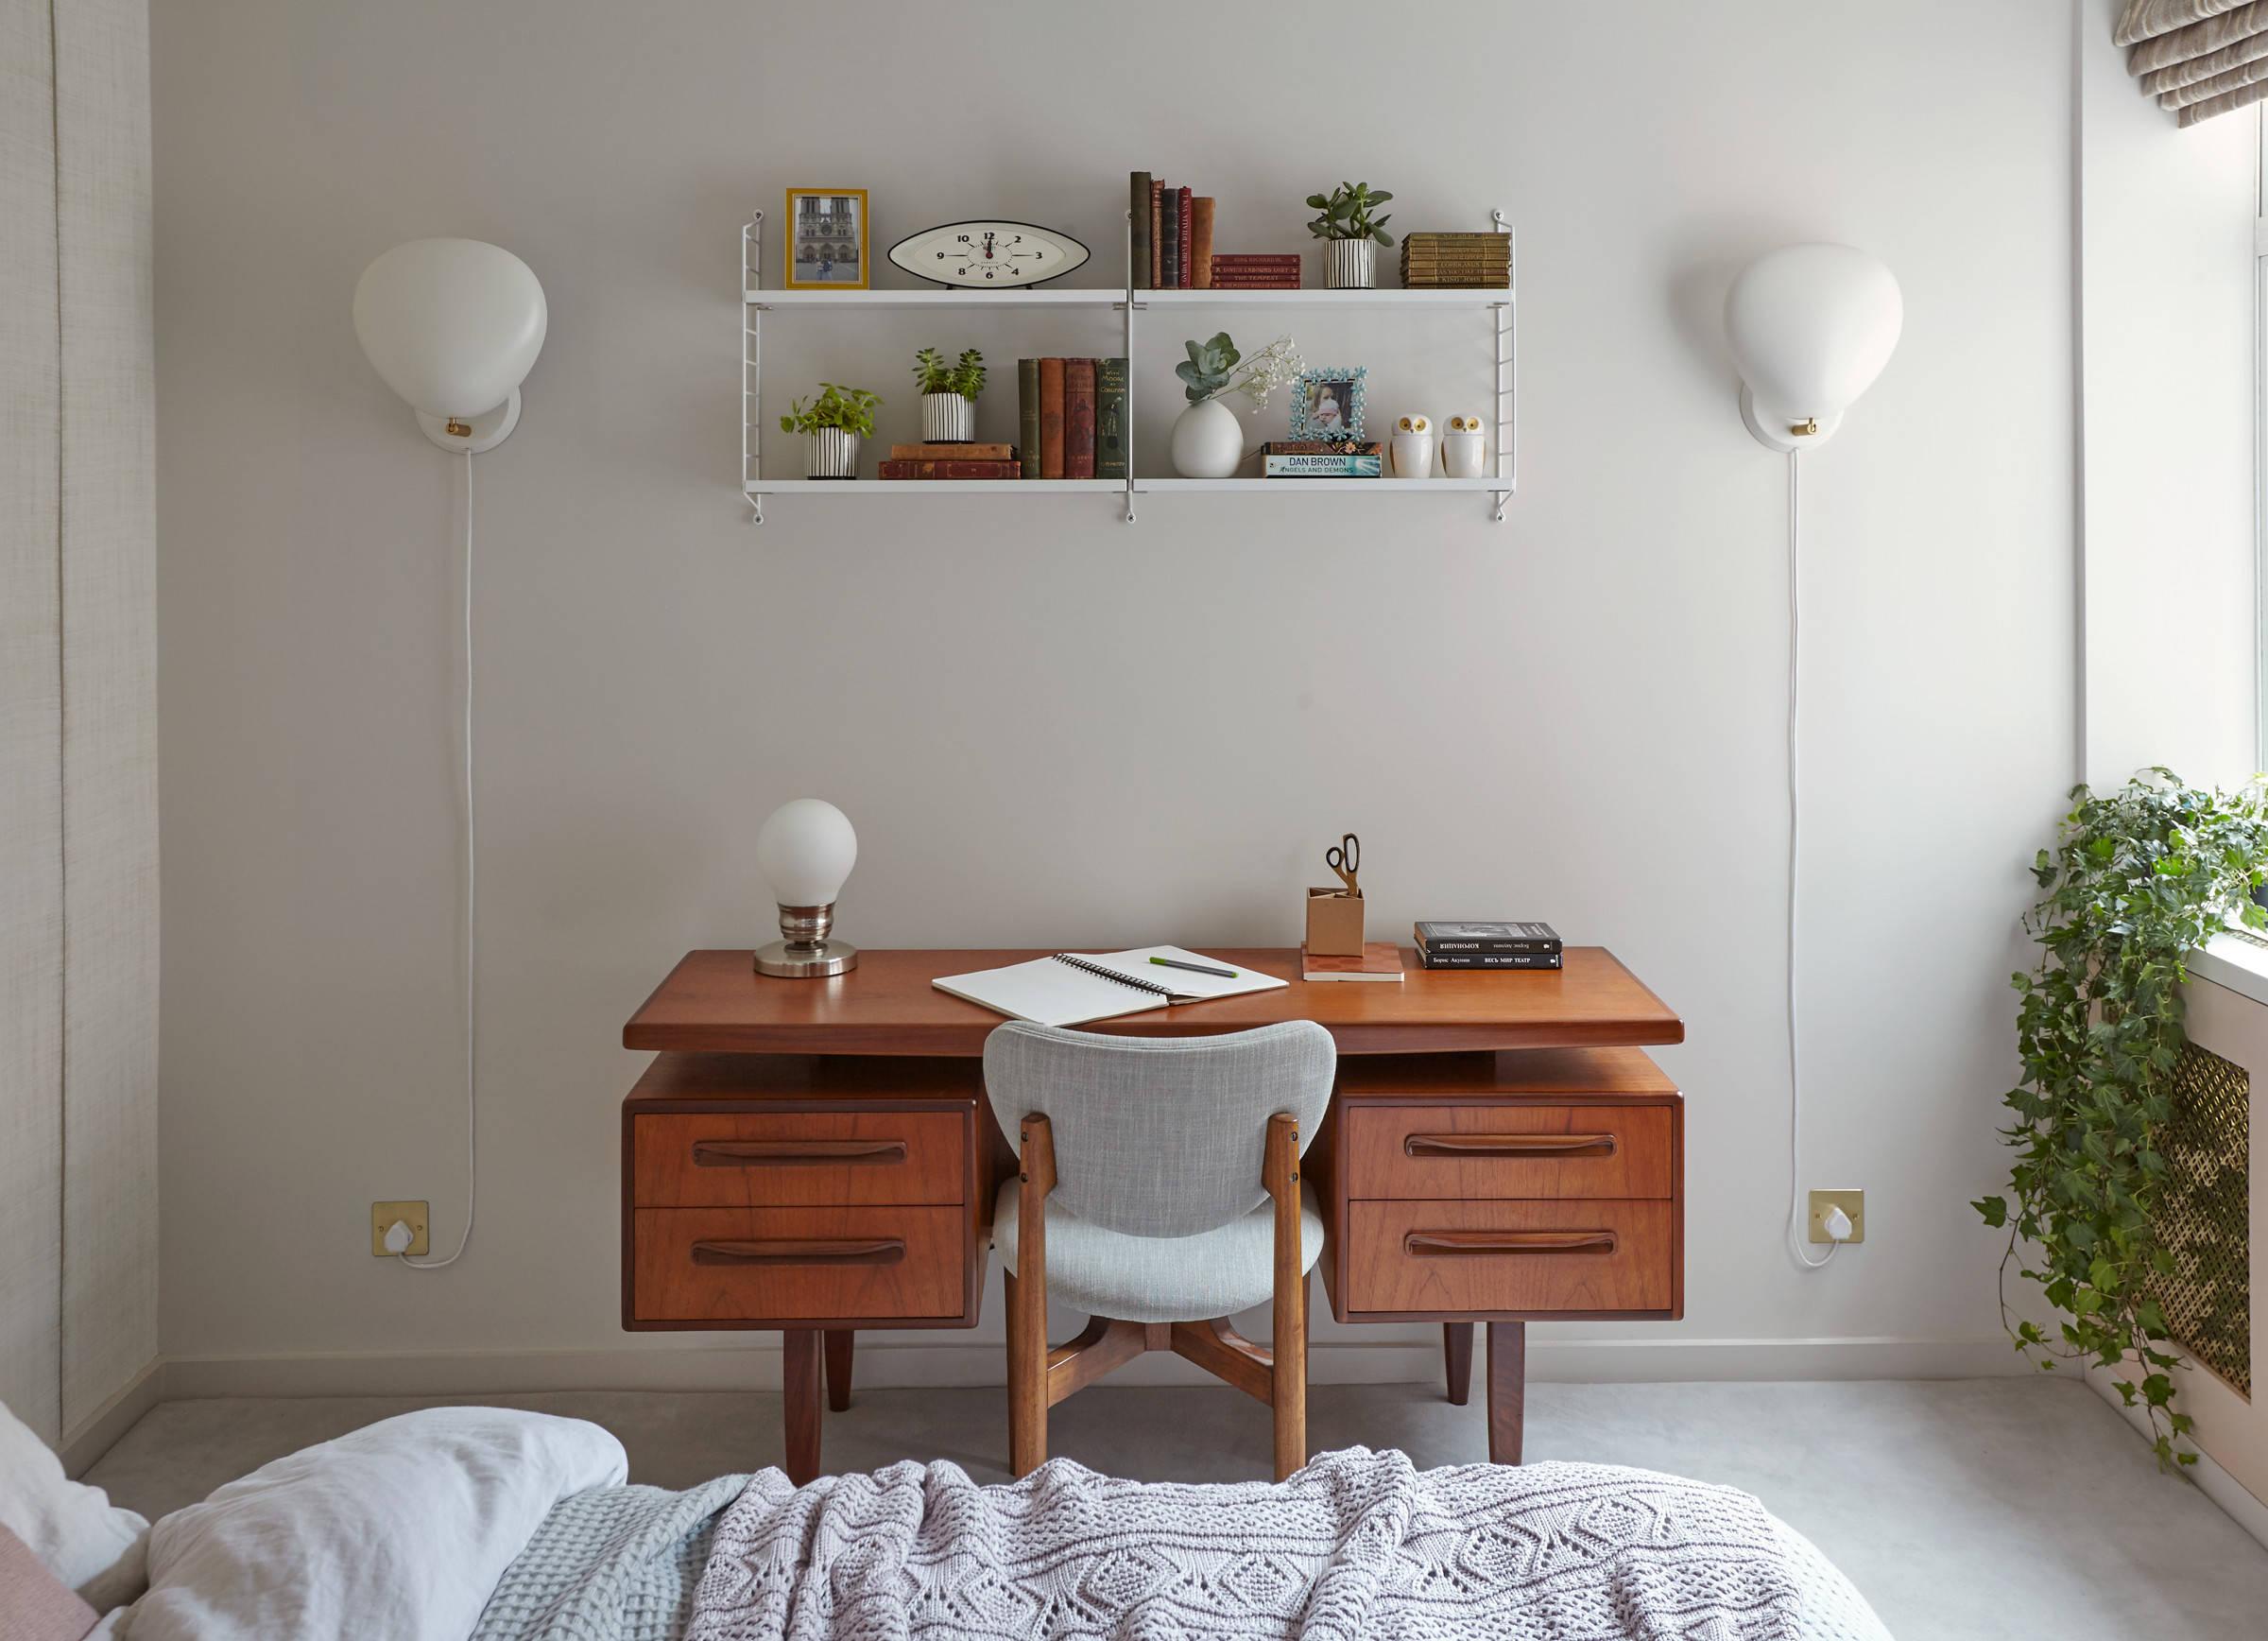 11 Beautiful Small Scandinavian Bedroom Pictures & Ideas - January